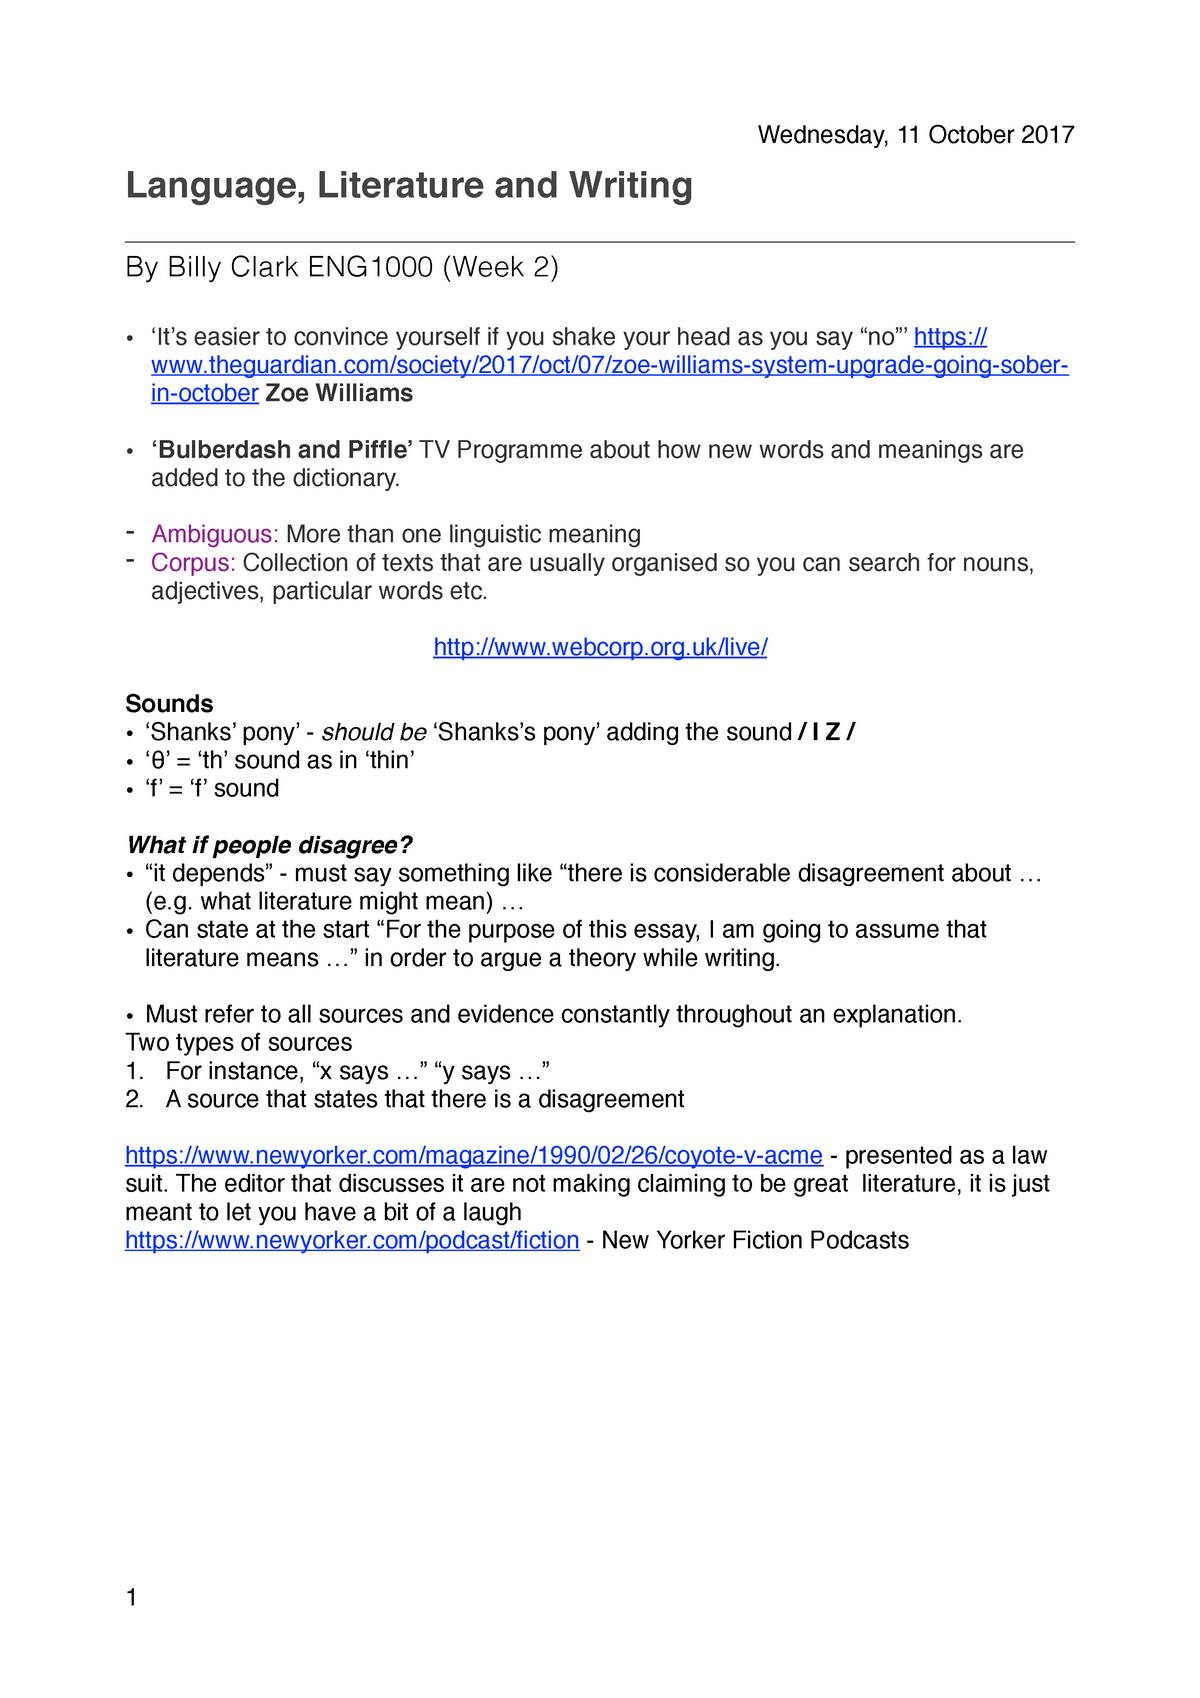 Week 2 Notes - language literature and writing - ENG1000